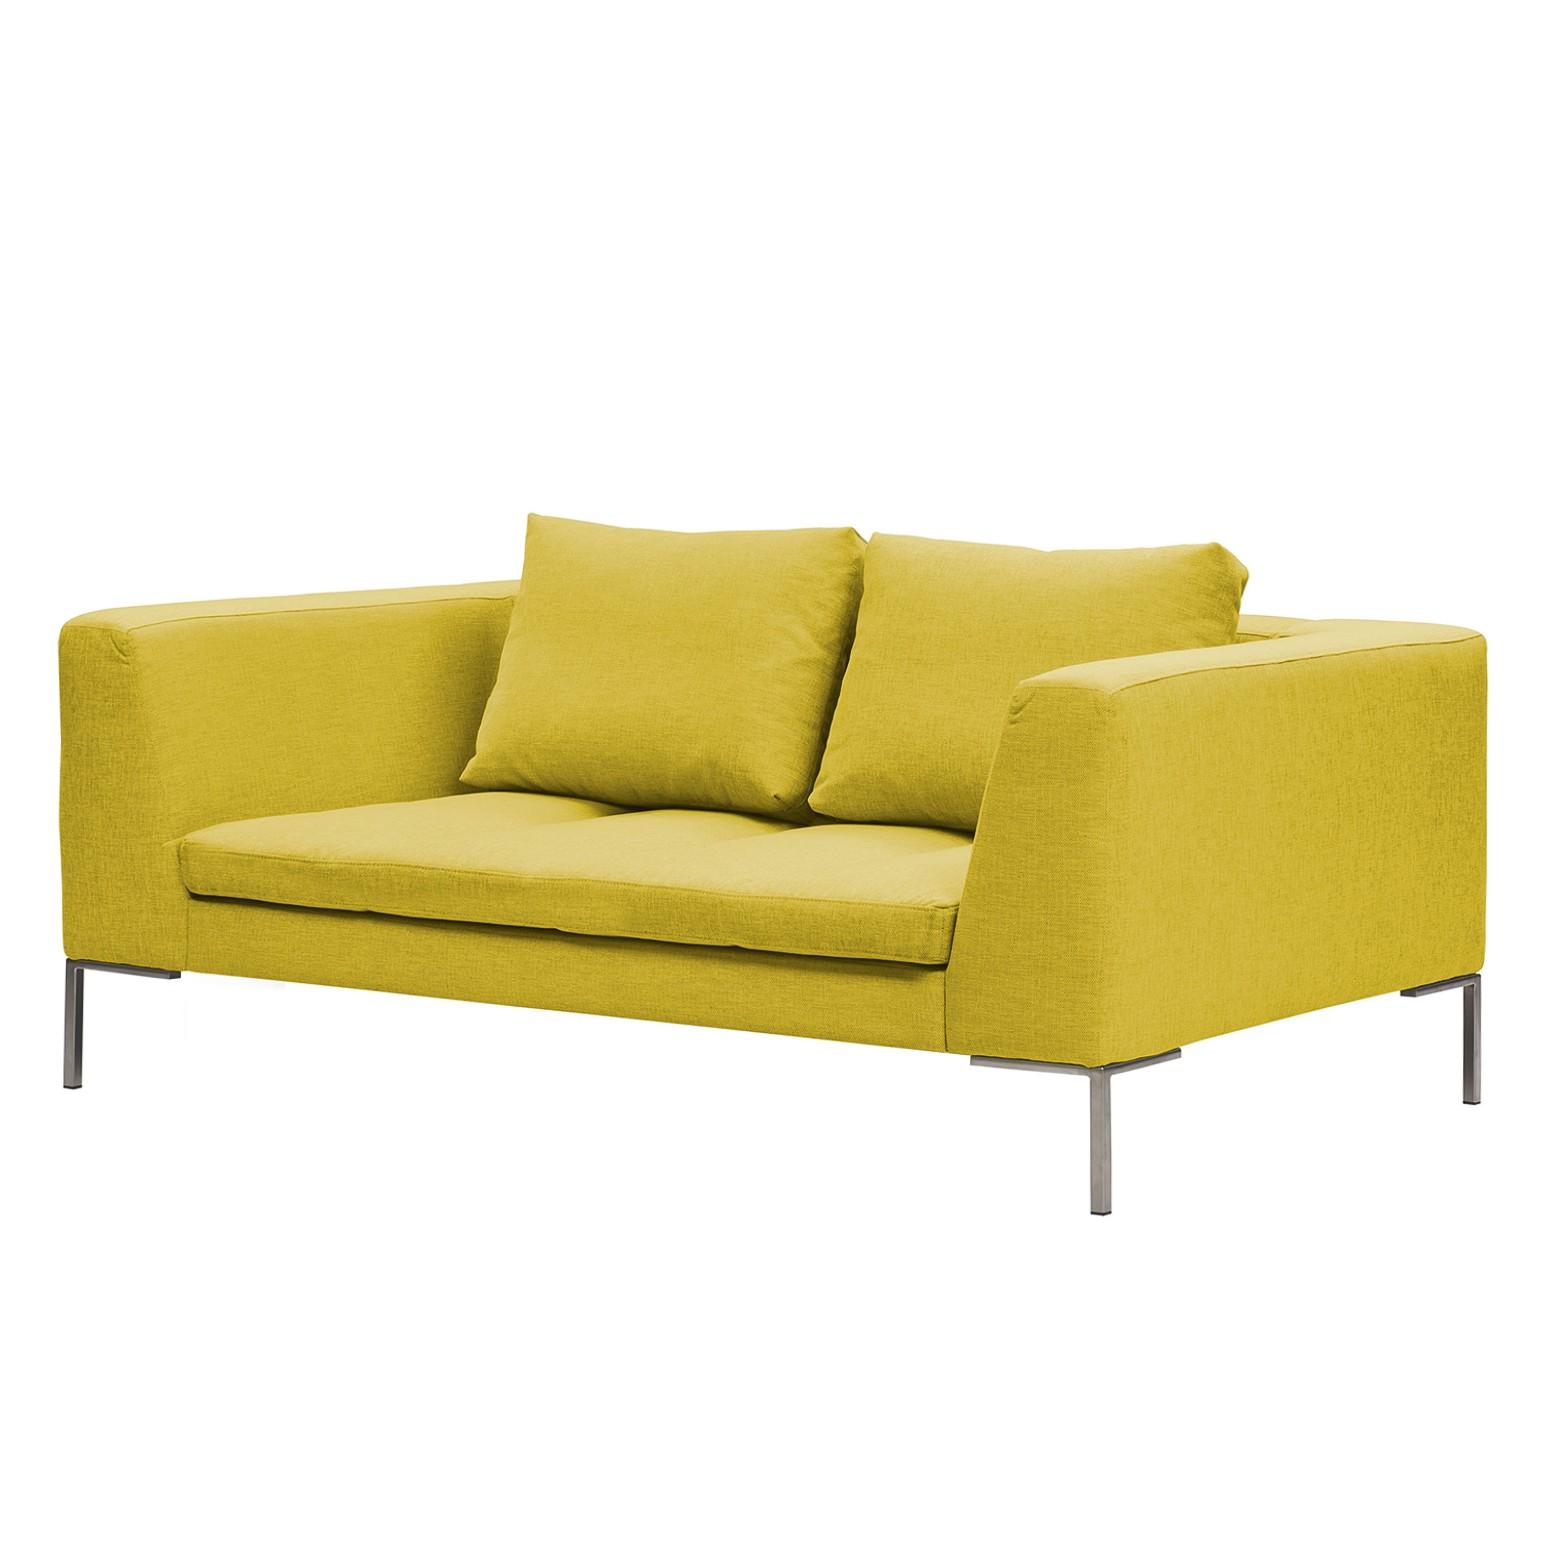 Sofa Madison (2-Sitzer) - Webstoff - Stoff Milan Gelb, Studio Copenhagen